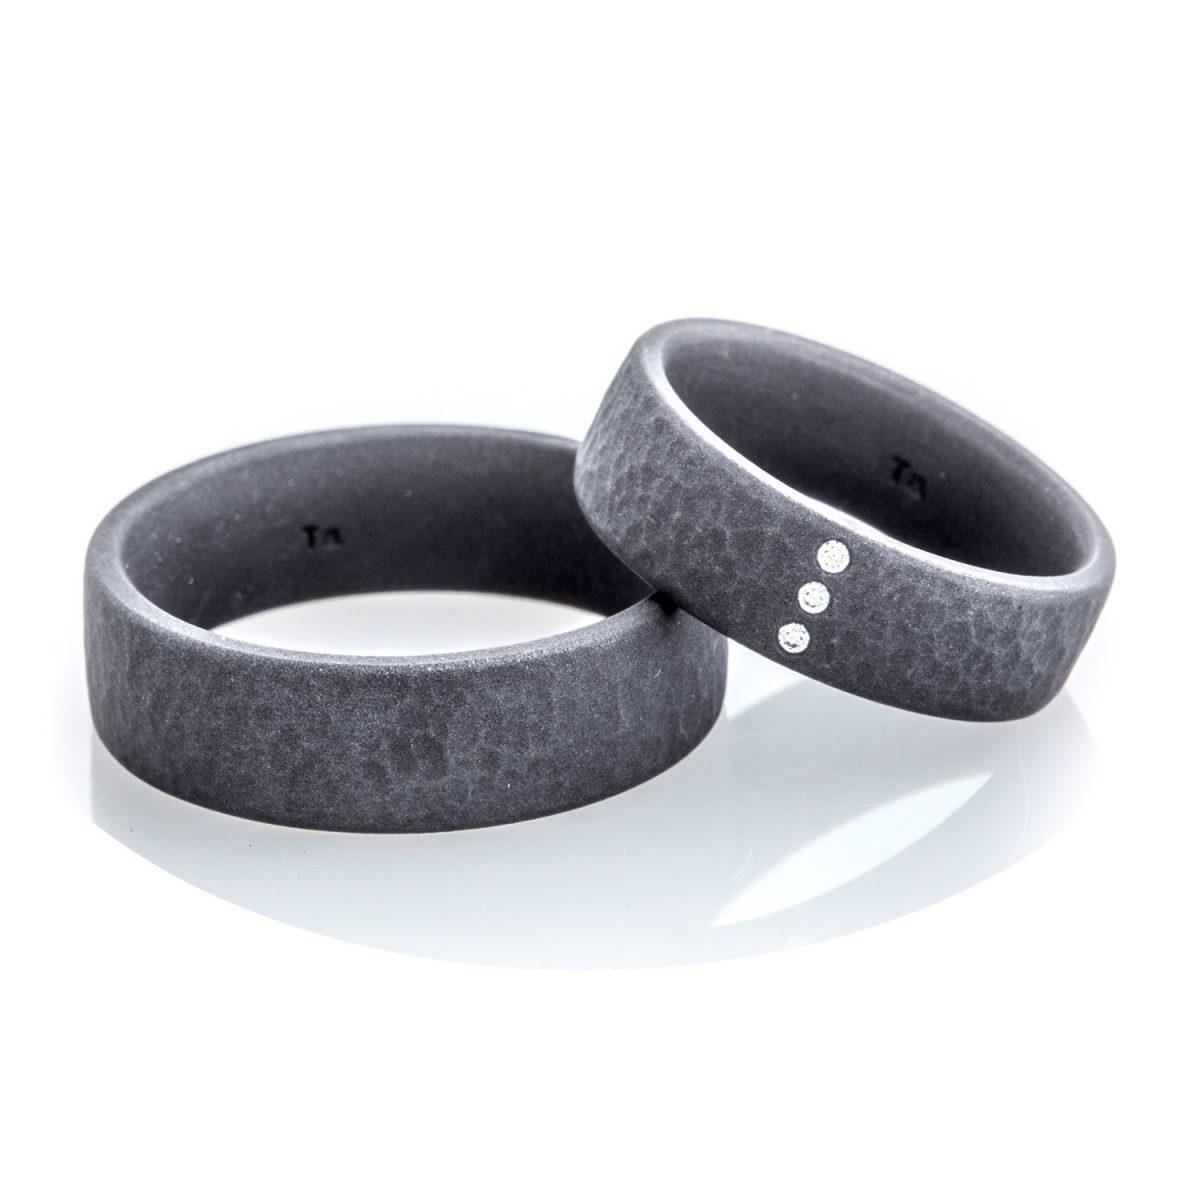 Tantal Hochzeitsringe | Ringpaar True Love Collection No:11